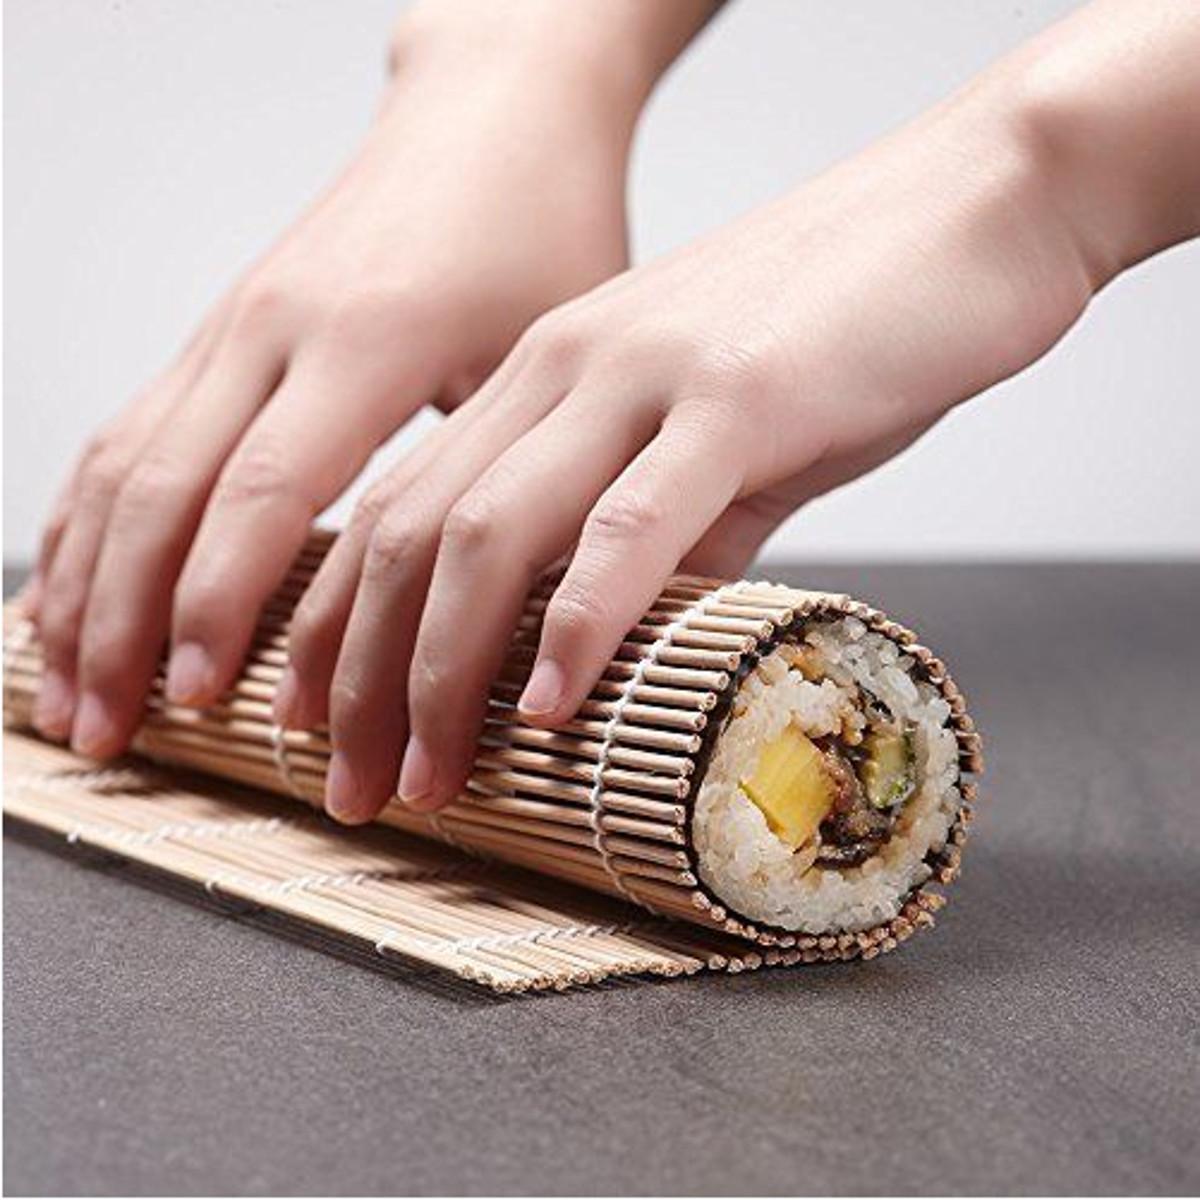 7 pcs Rolling Mats Chopsticks Rice Spreader Paddle Bamboo Sushi Making Kit BBQ Mat